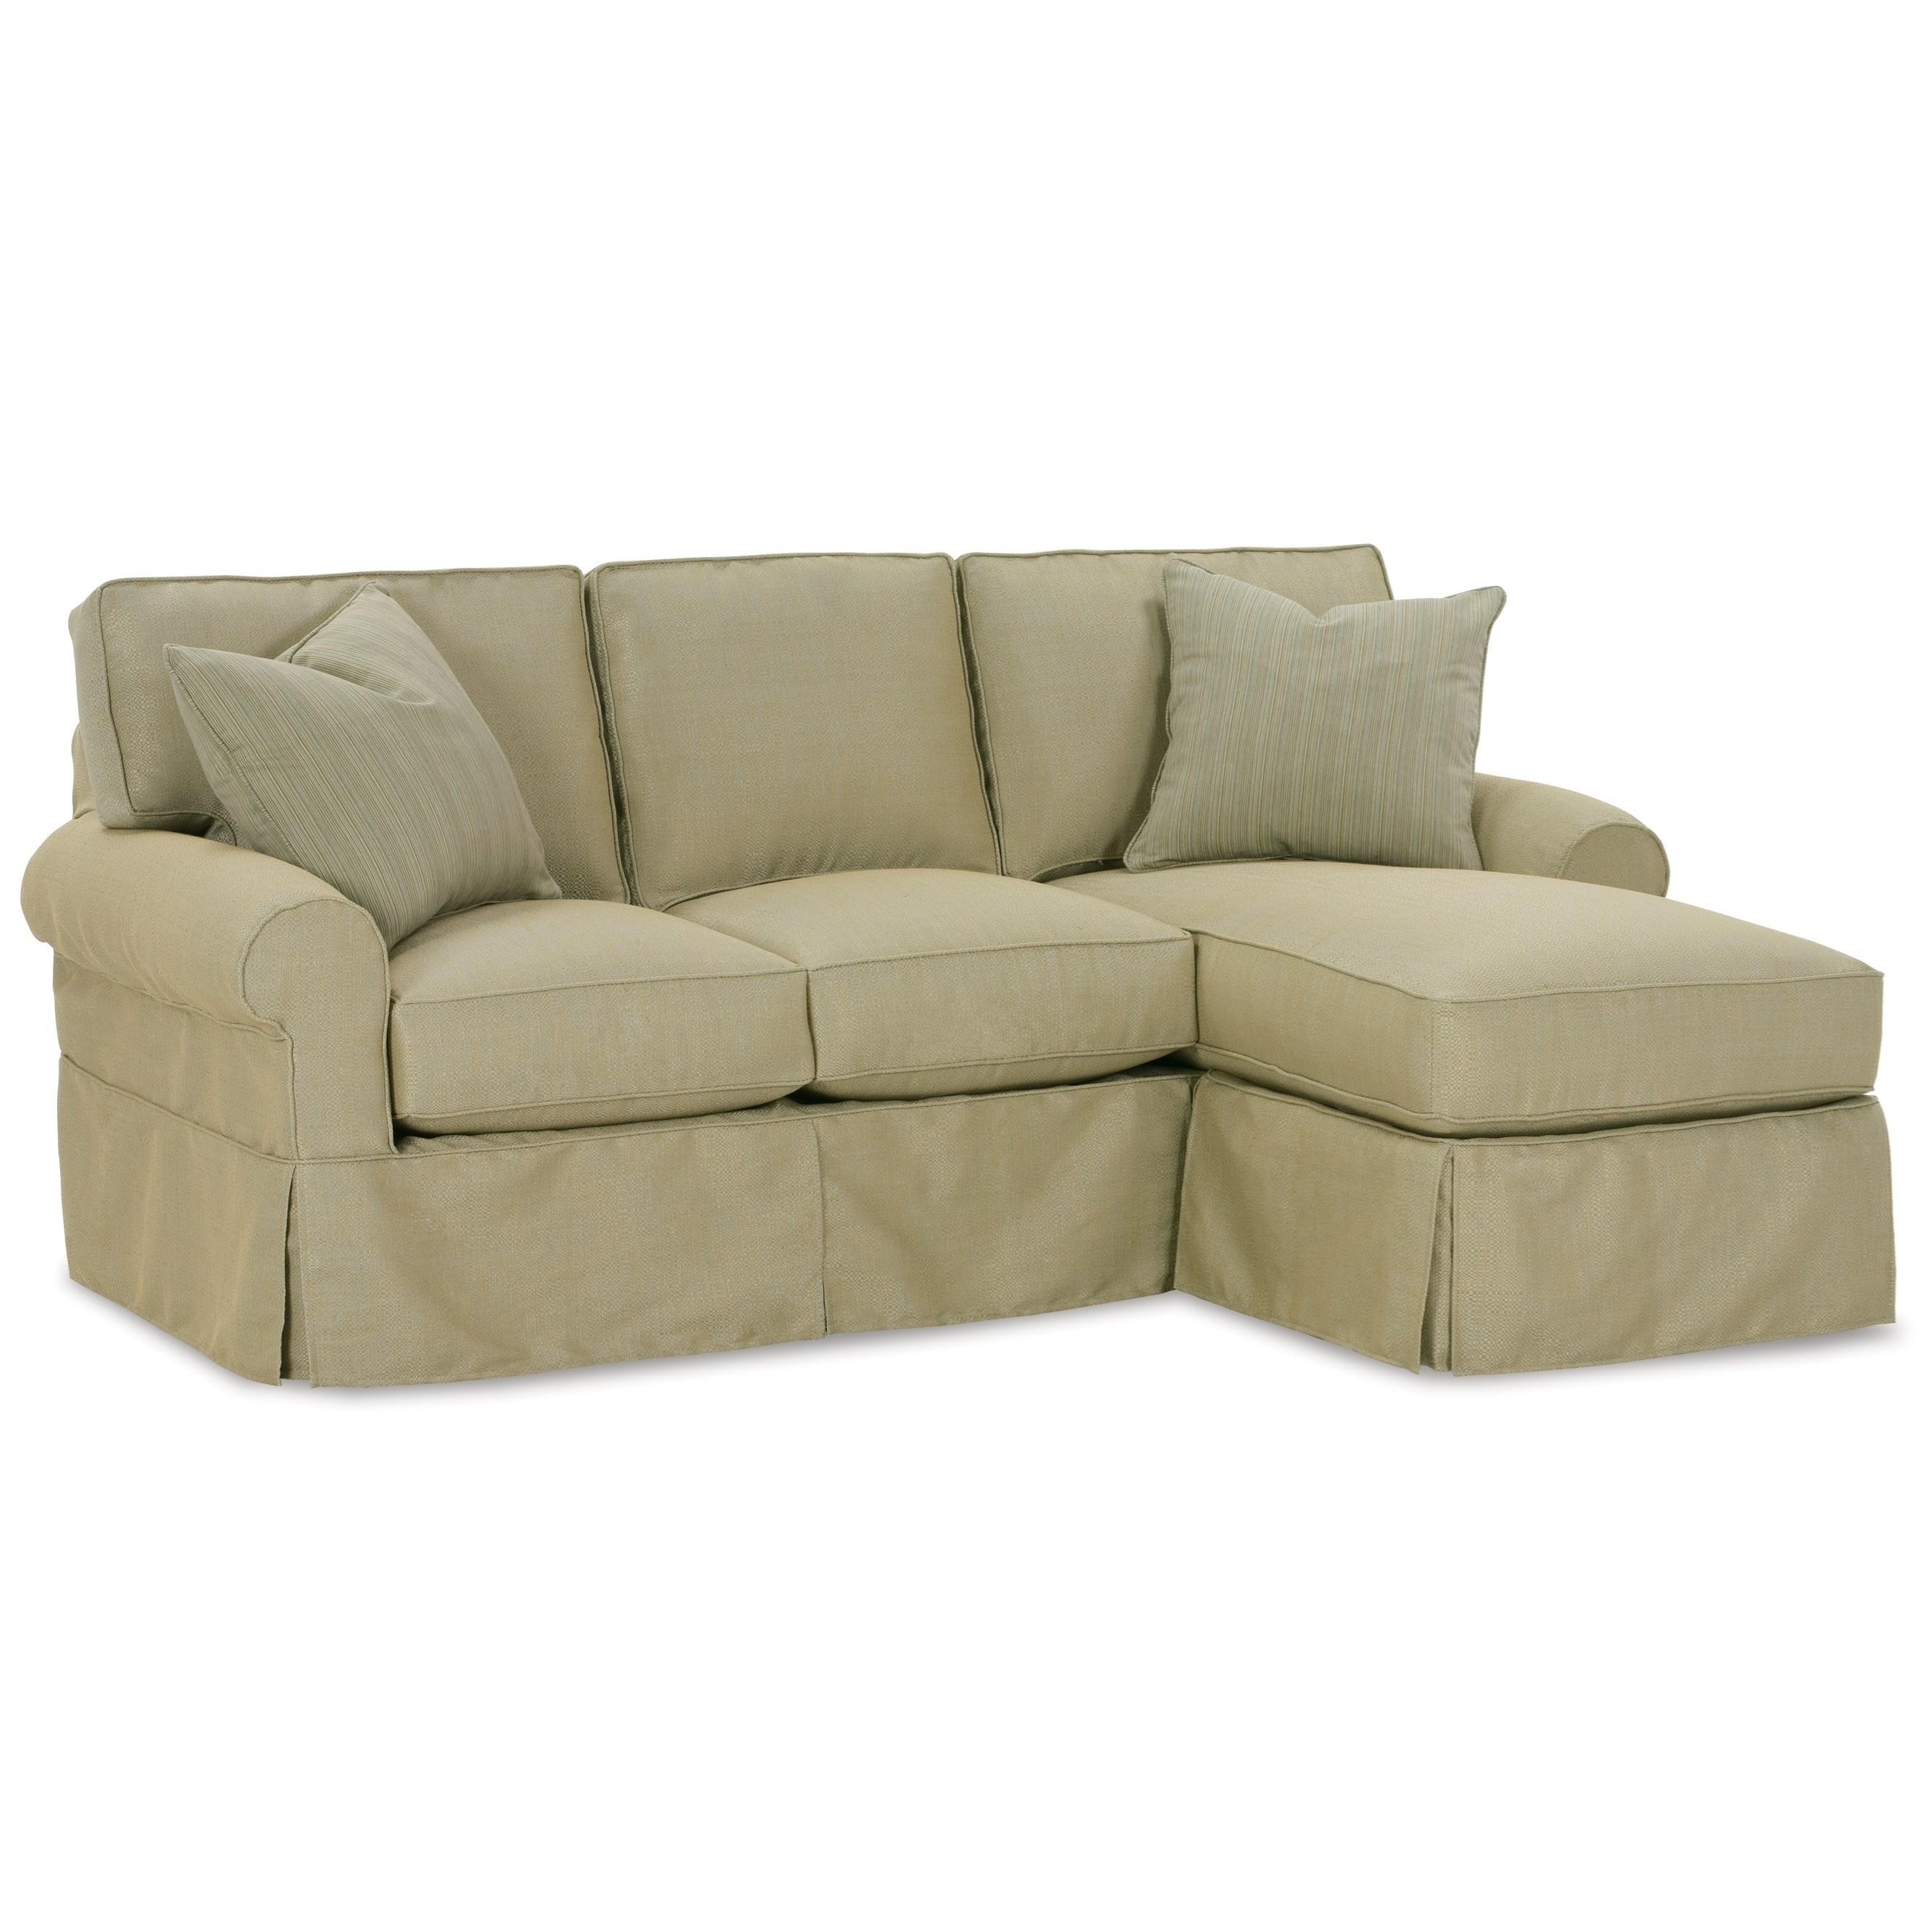 Elegant Rowe Nantucket Slipcover Sofa With Chaise With Rowe Sofa Slipcovers